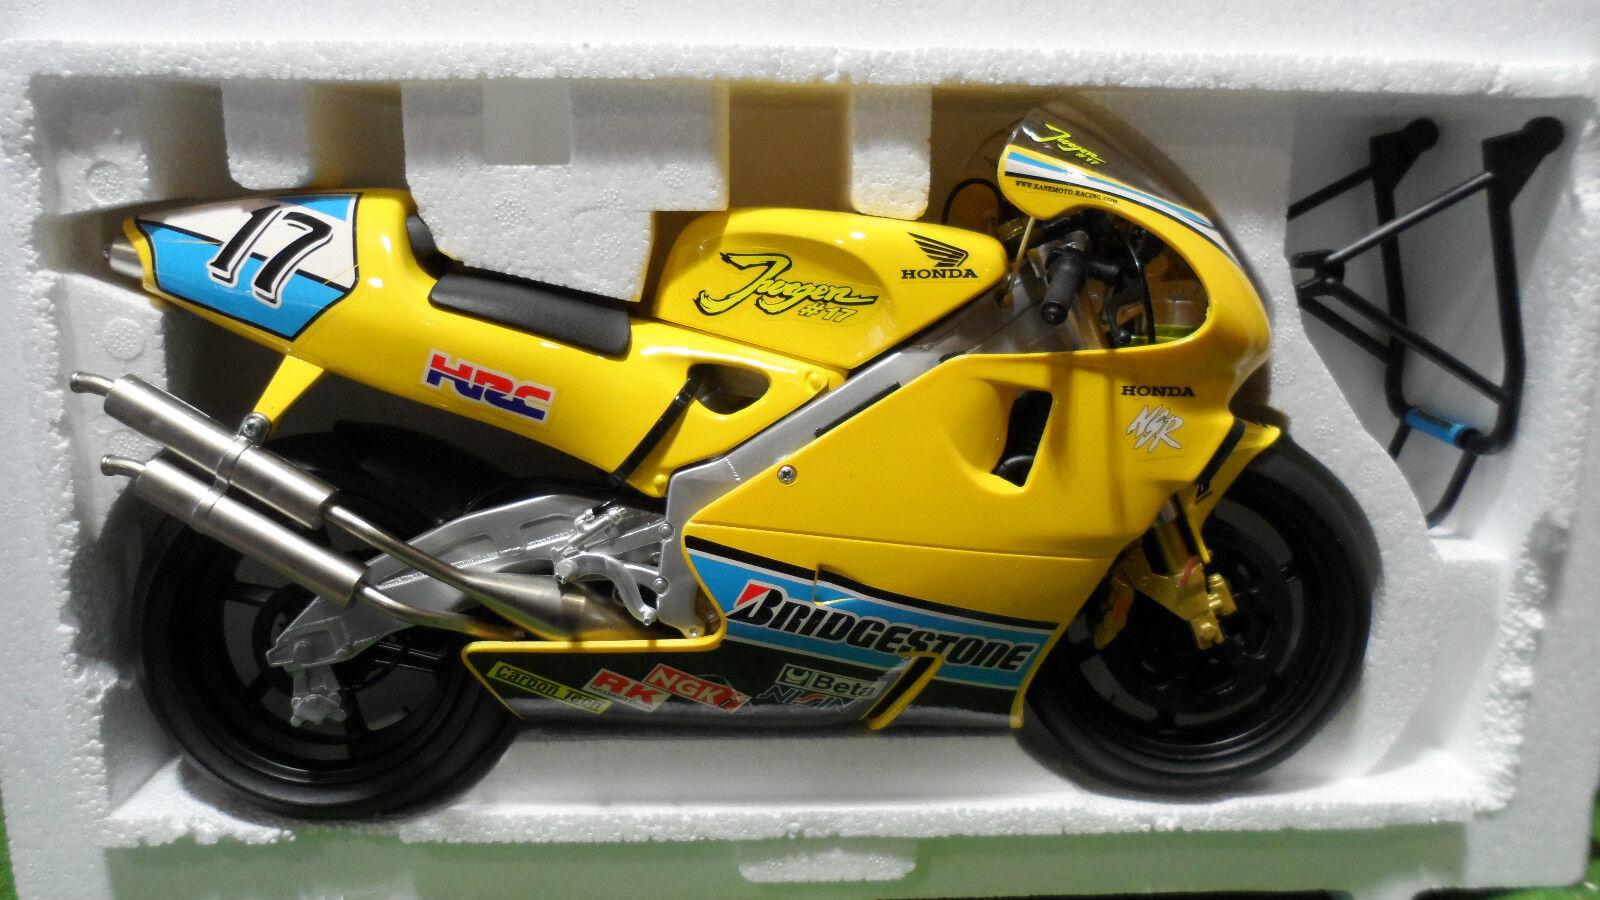 MOTO HONDA NSR 500  17 Jurgen vd GOORBERGH giallo 1 6 GUILOY 16271 miniature